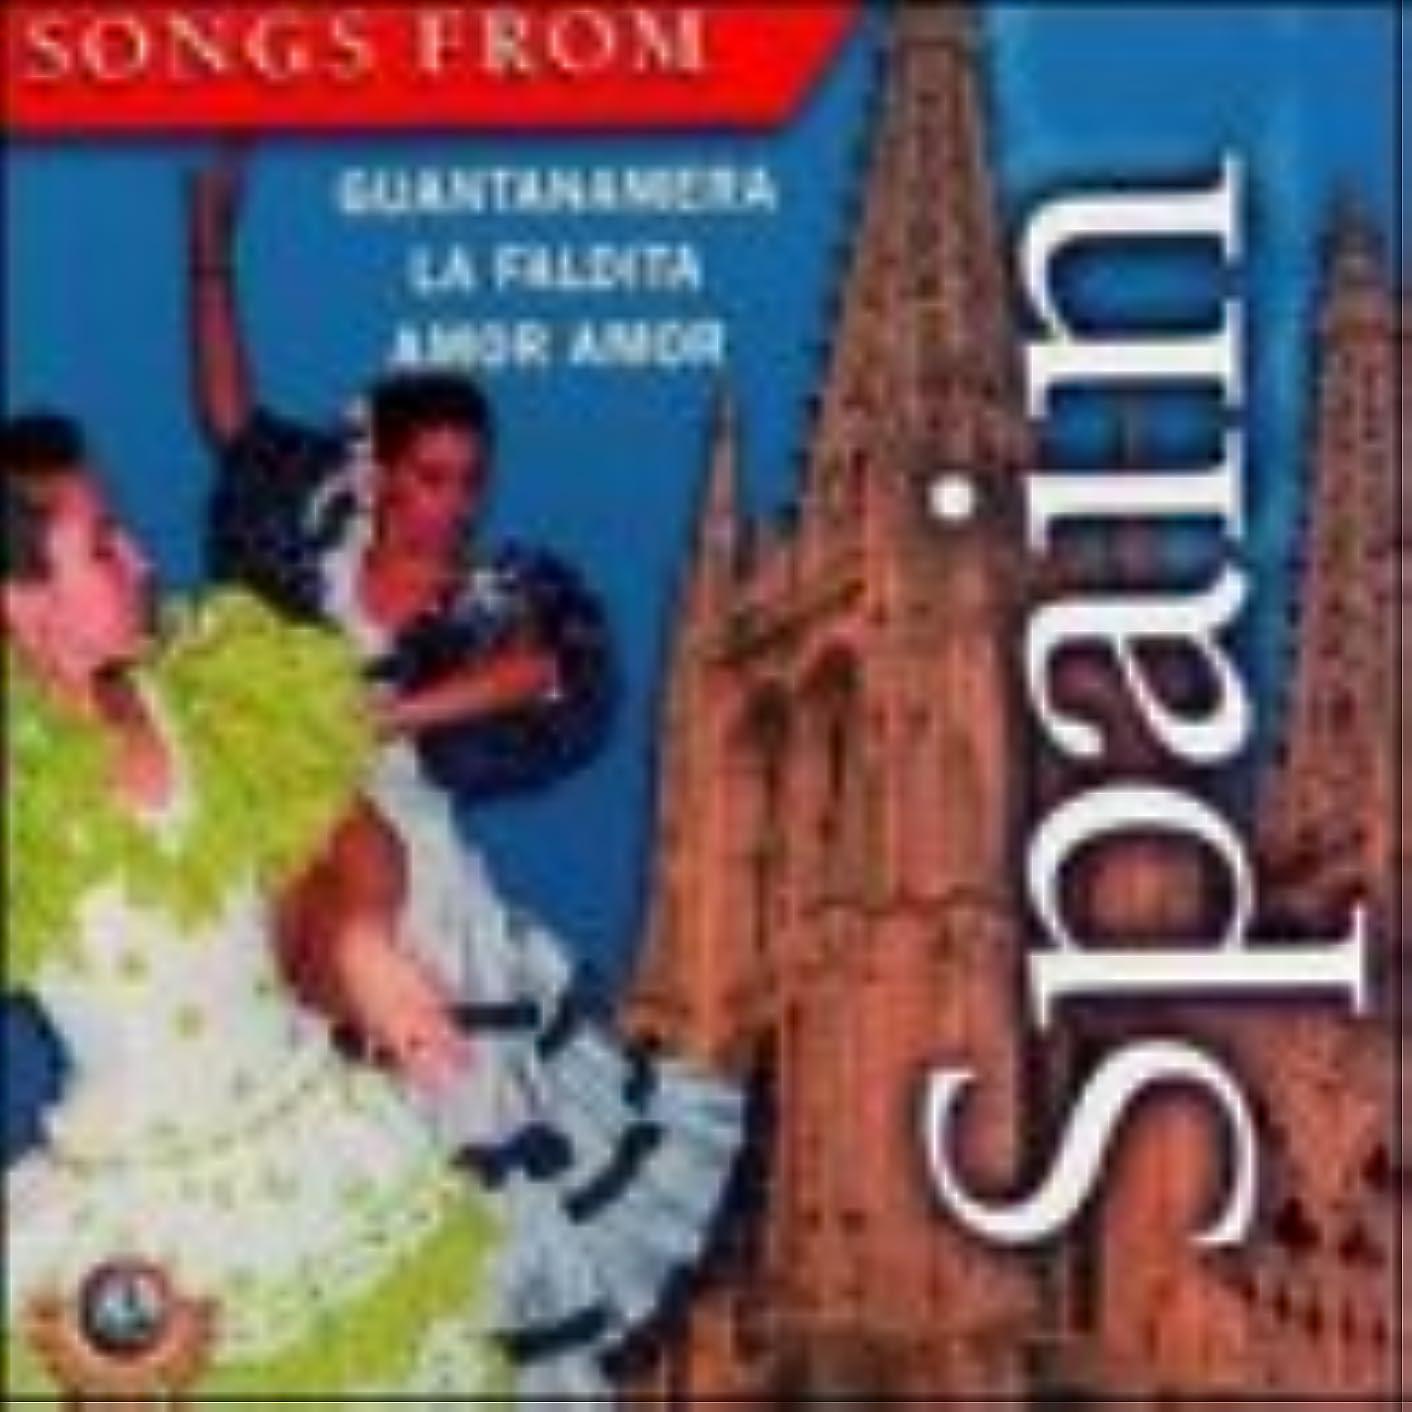 Songs From Spain